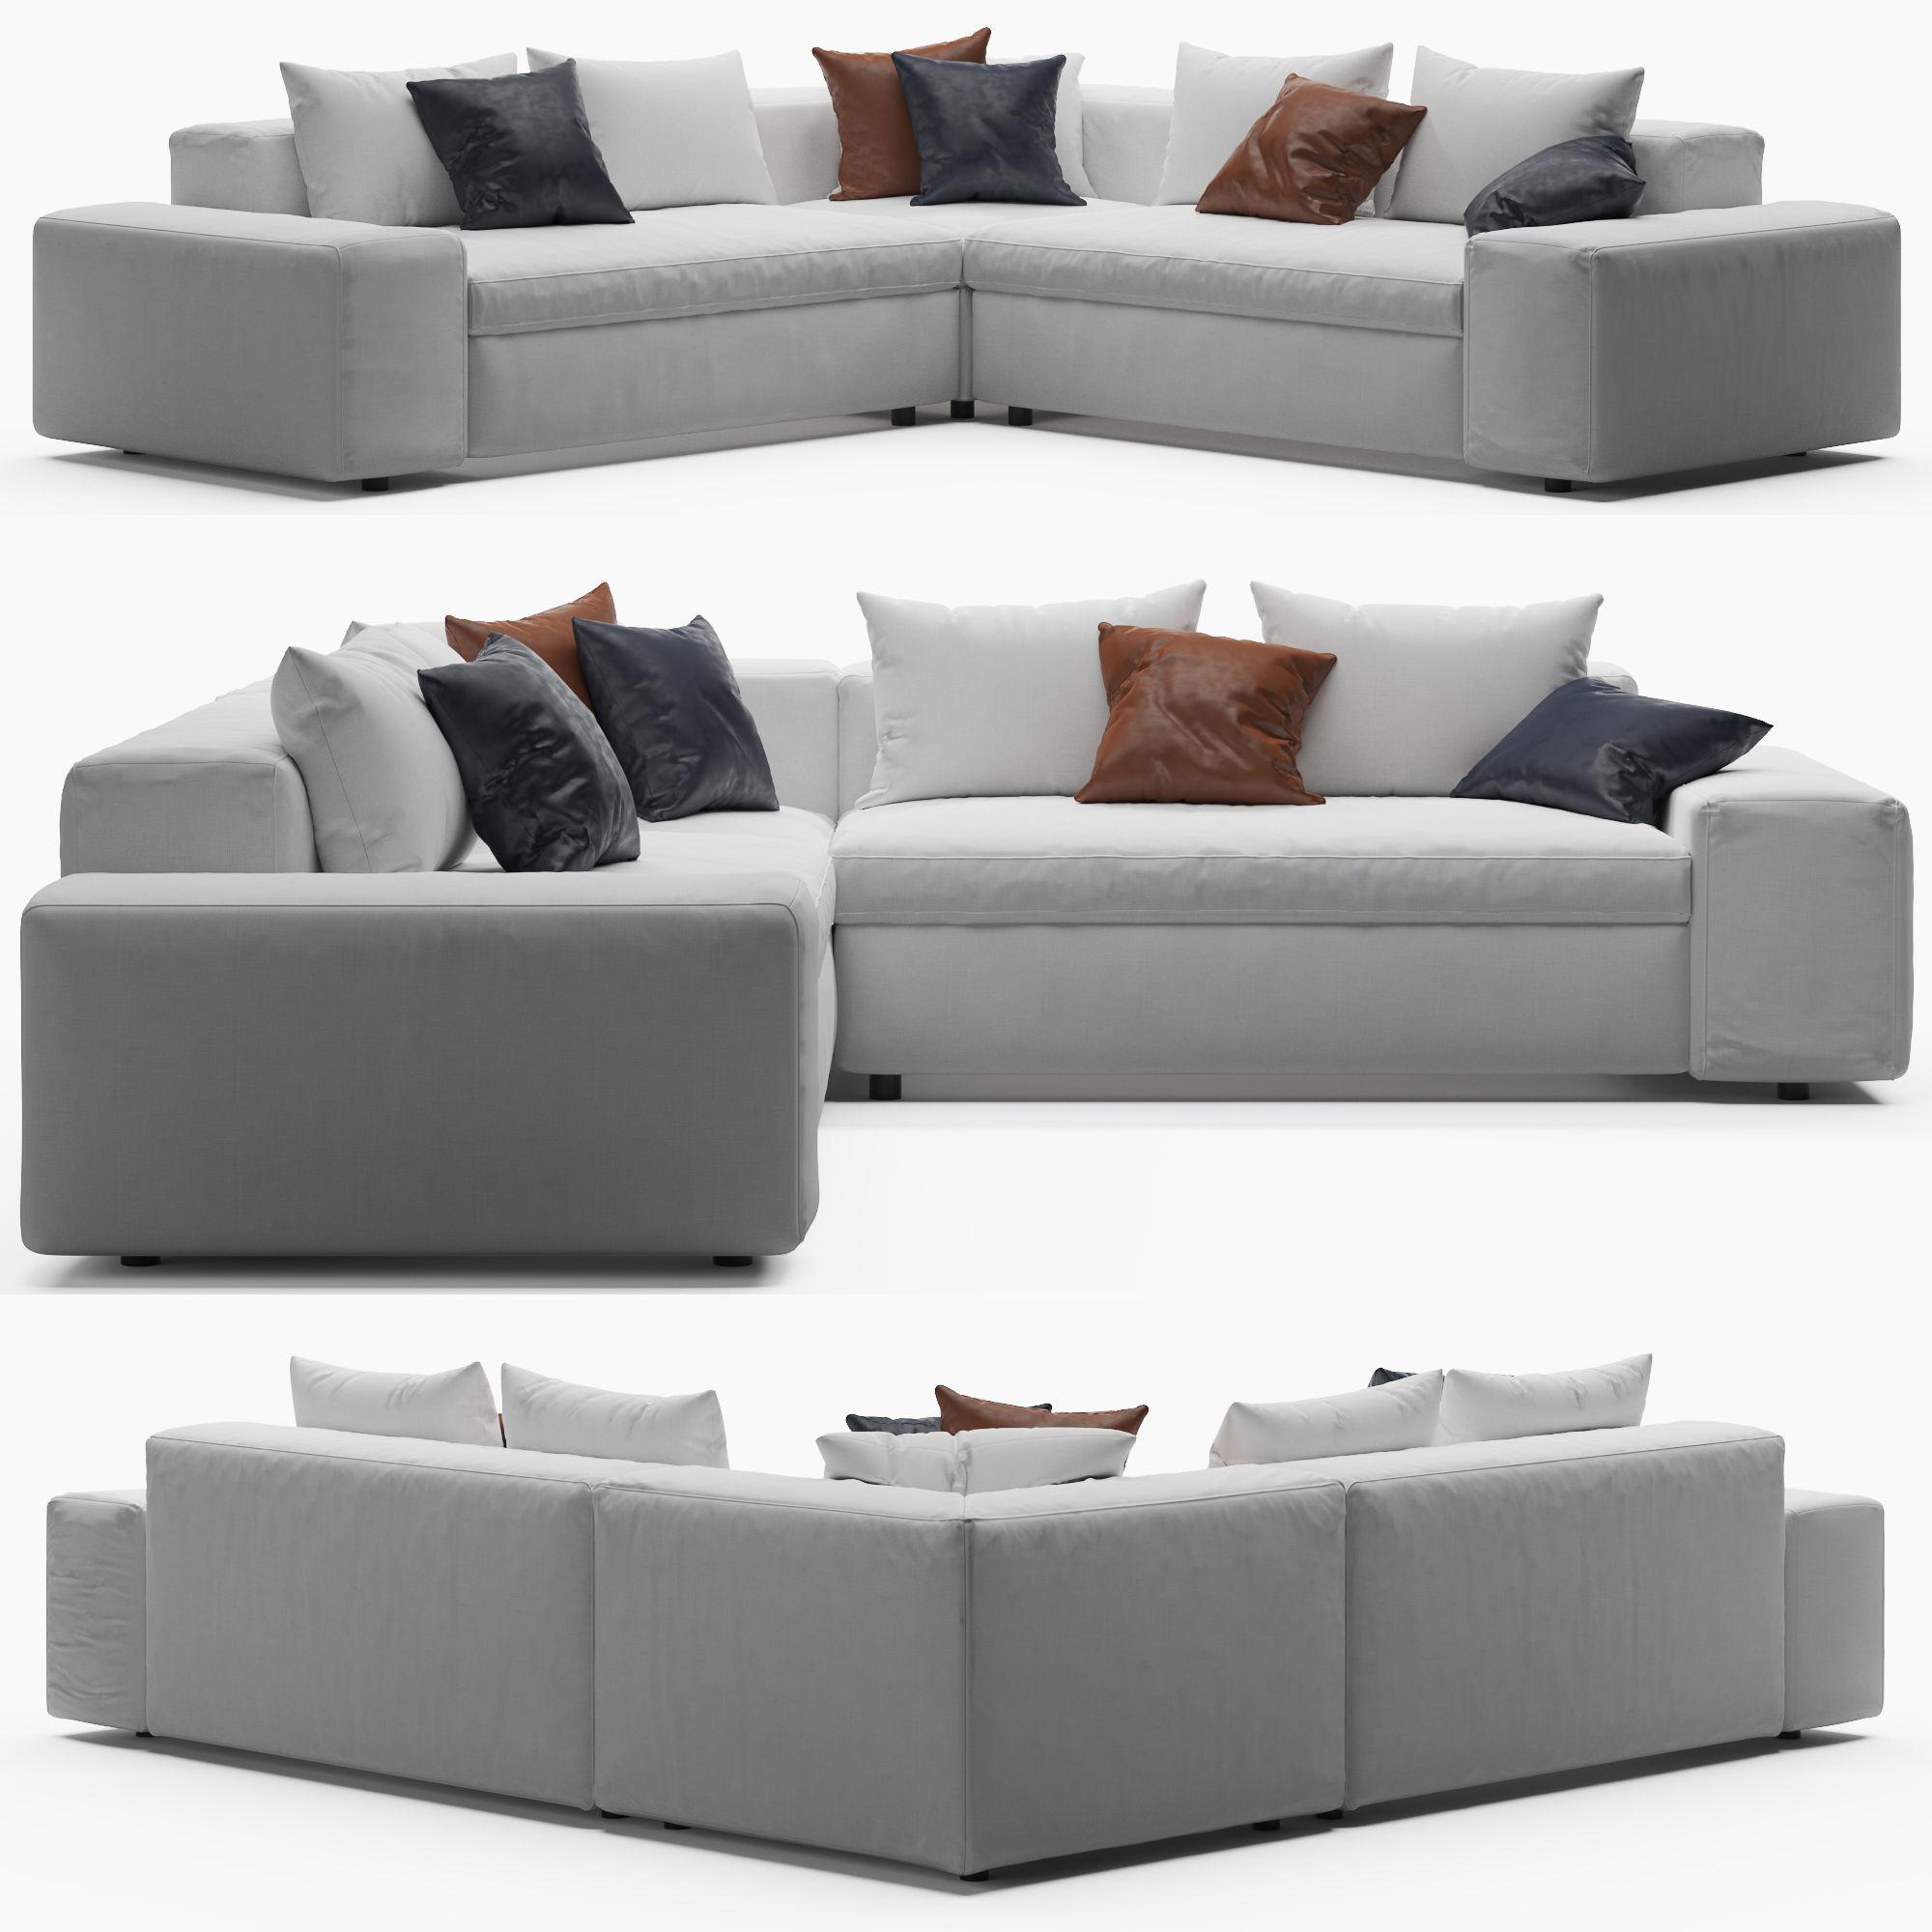 cb2 arlo sectional sofa 3d model